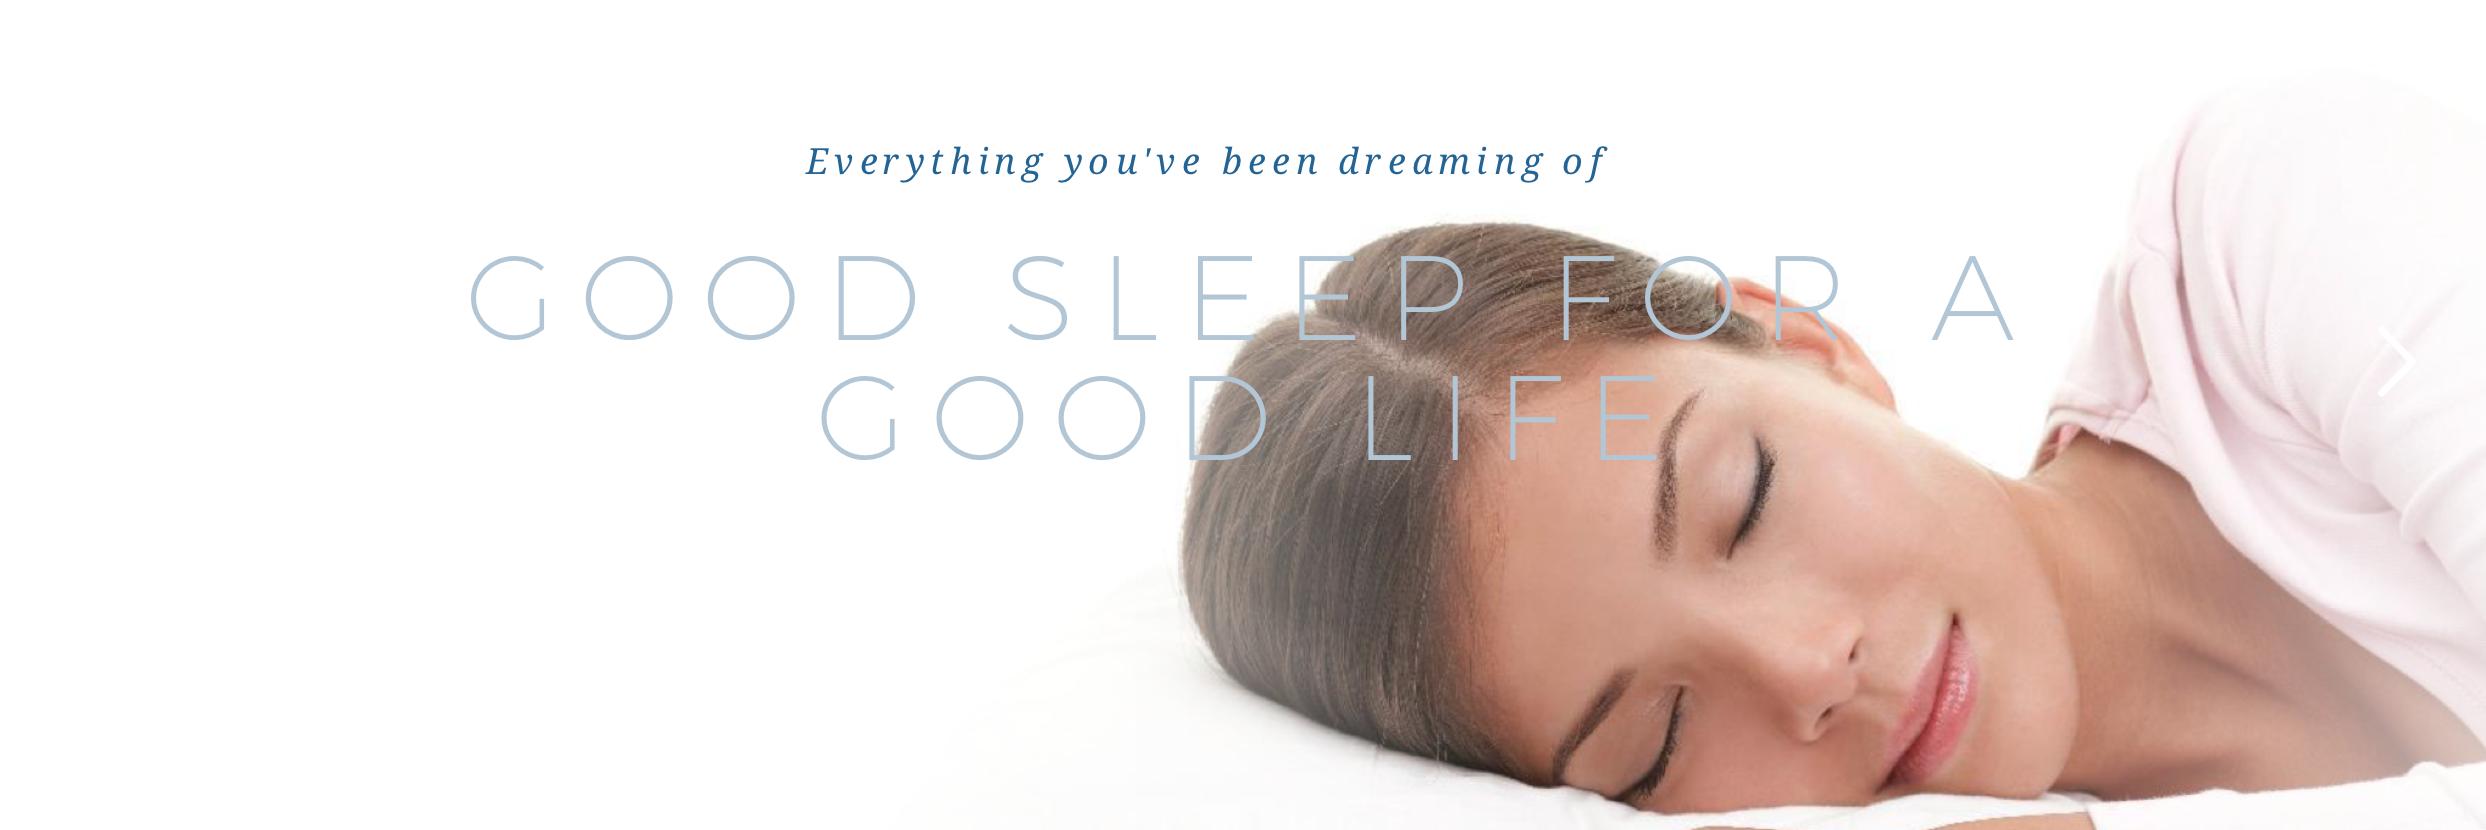 Good Sleep for a Good Life.